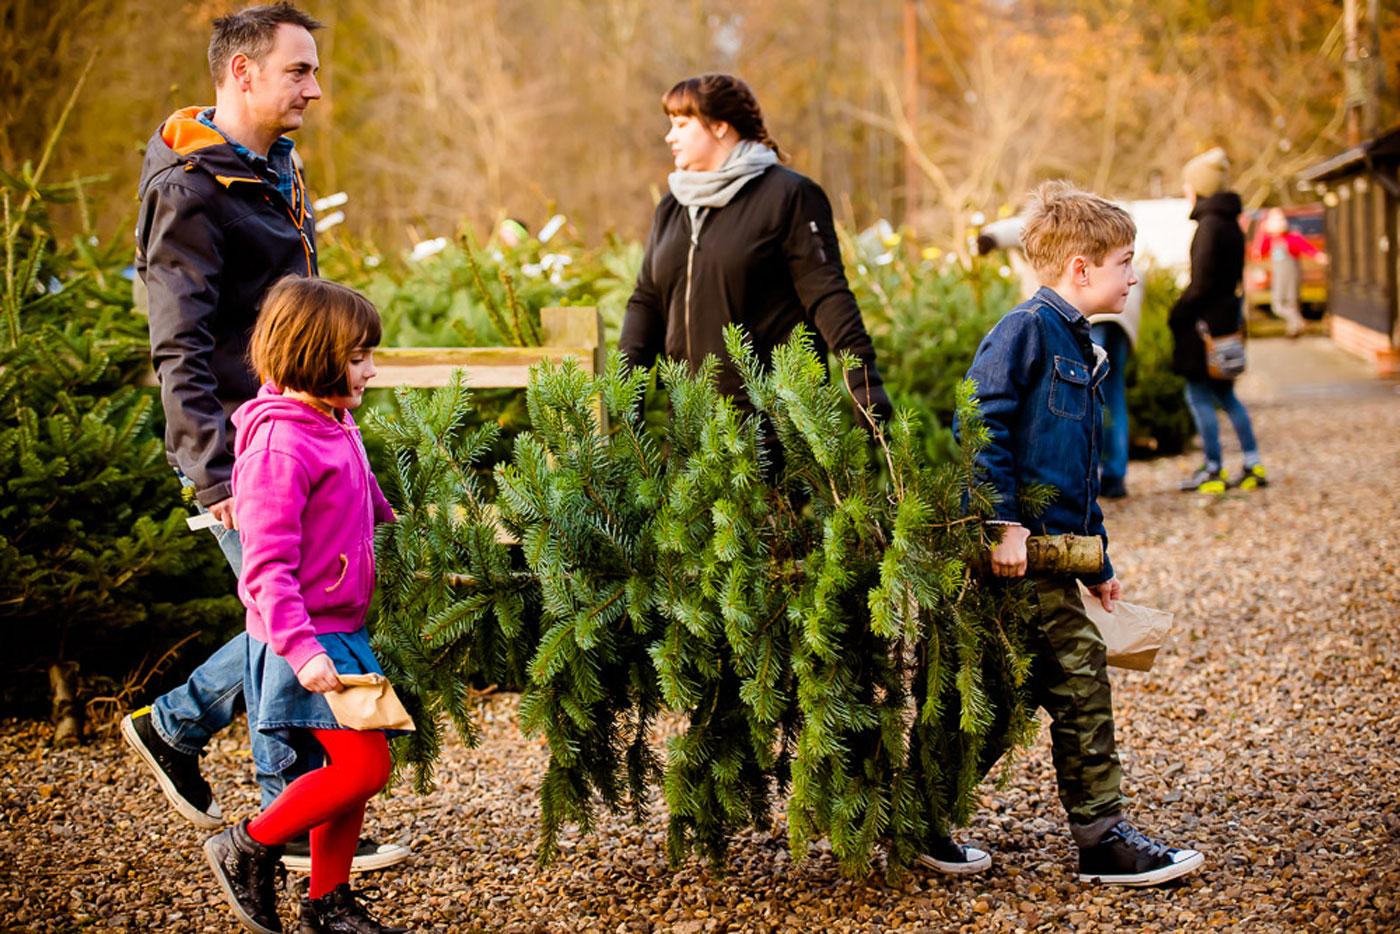 Family purchasing a lush Christmas tree